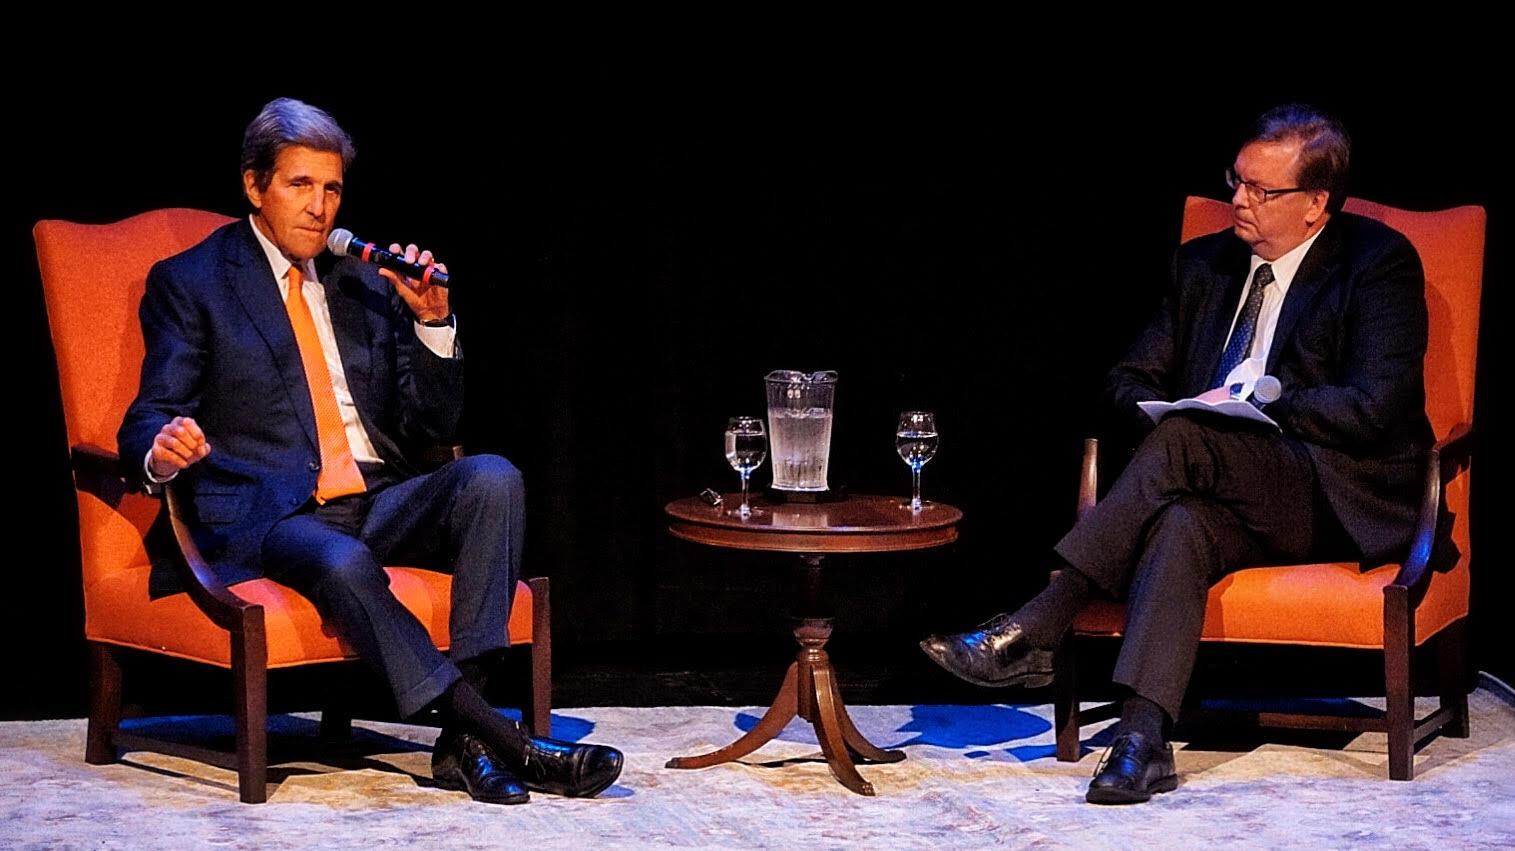 Photo by Ting'an Lu '21  John Kerry, former secretary of state and Massachusetts senator, spoke at Mount Holyoke on Tuesday.